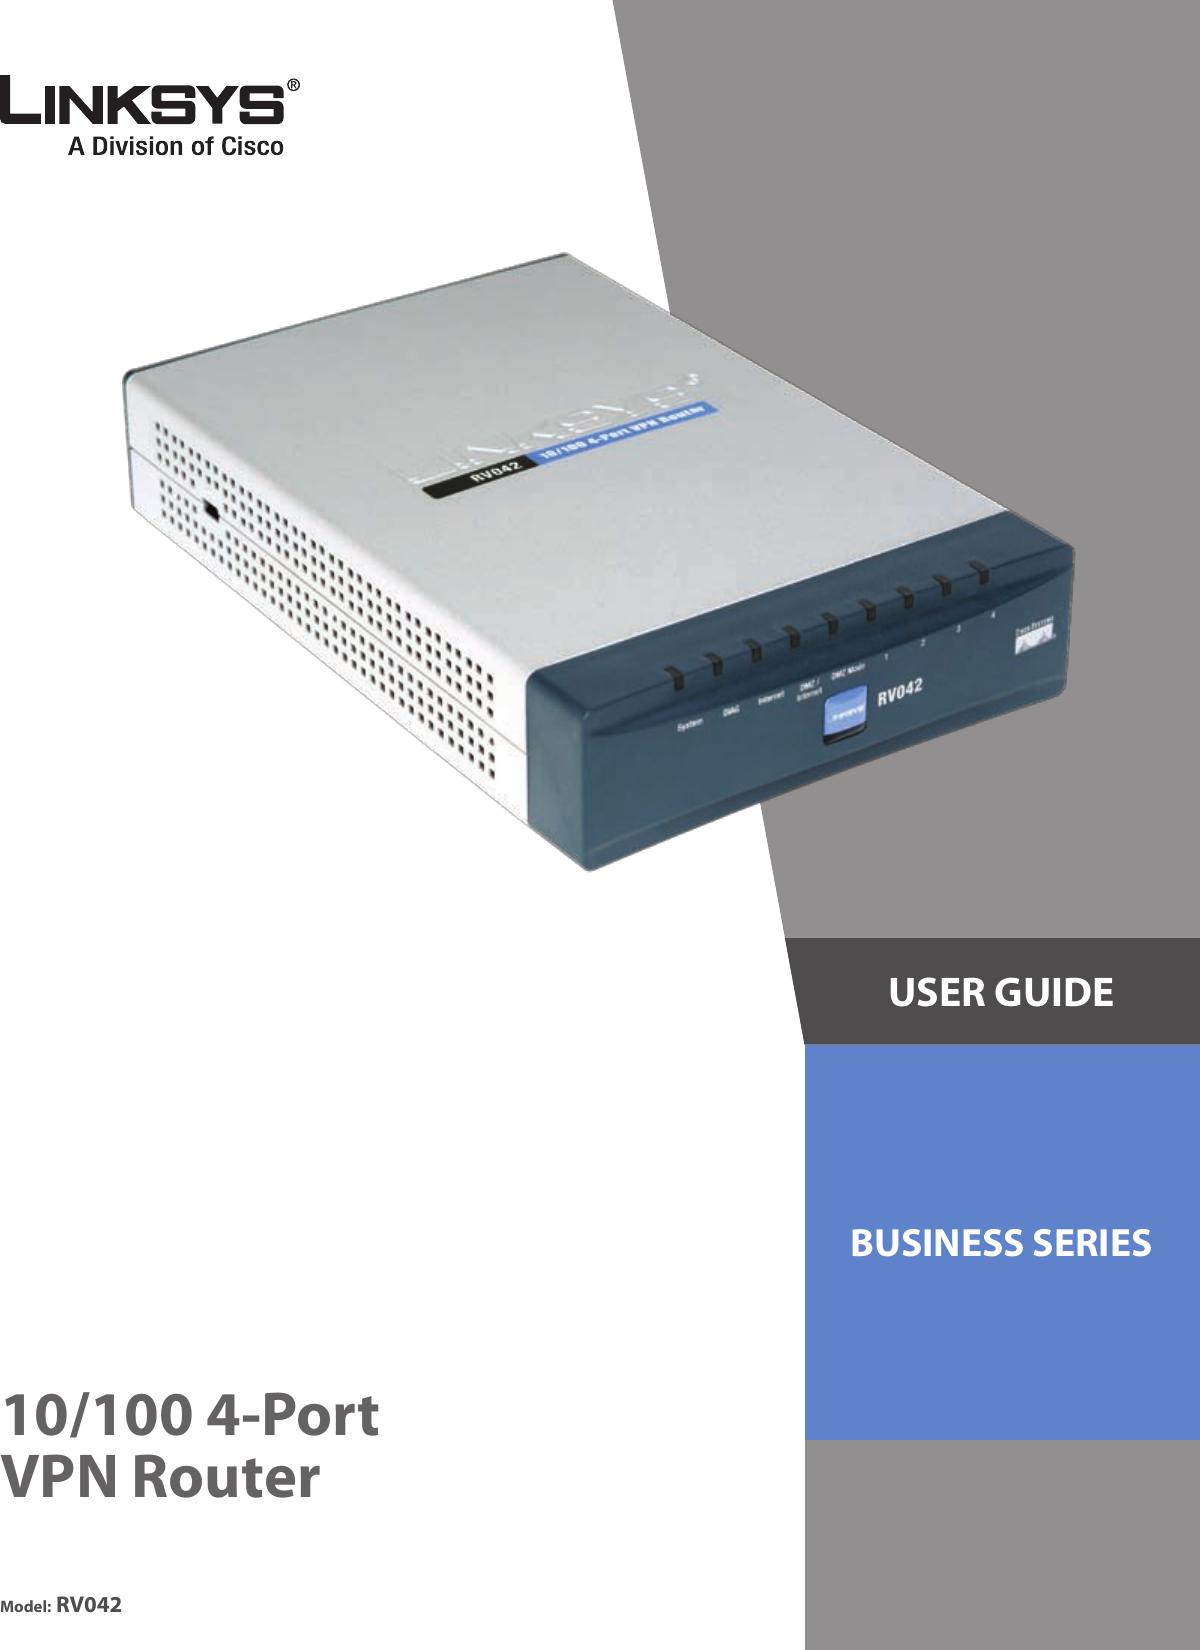 linksys rv042 v1 firmware download